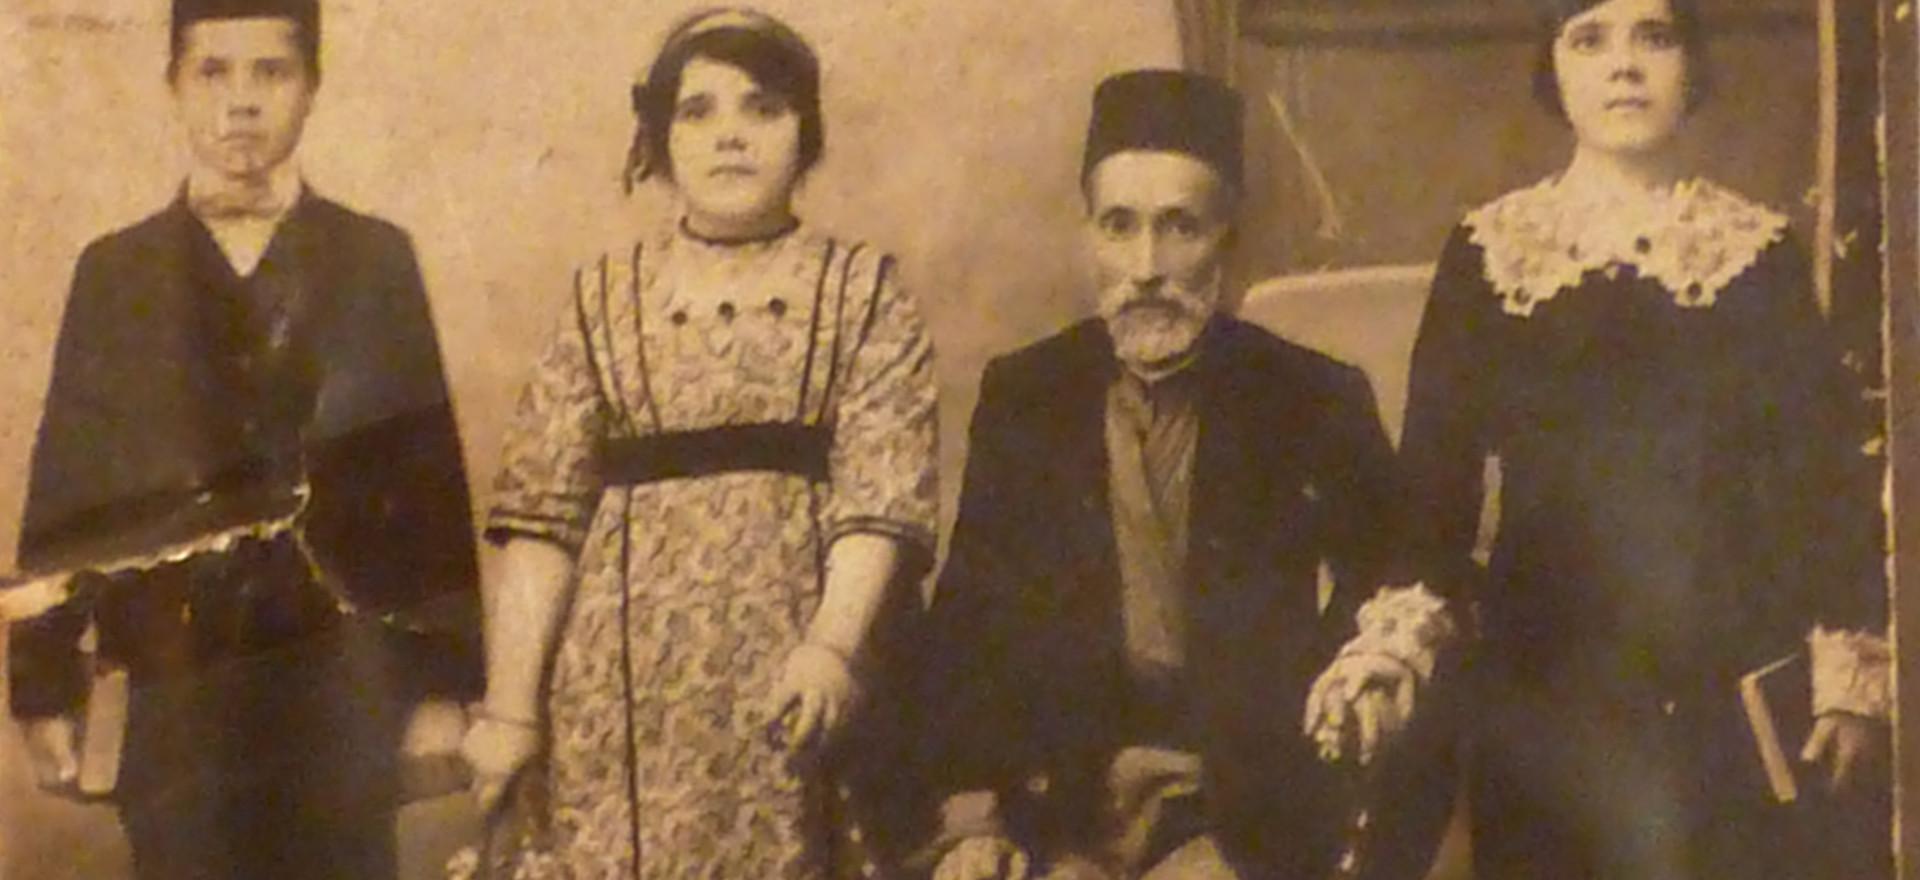 Roger Bilboul: Alexandria 1915